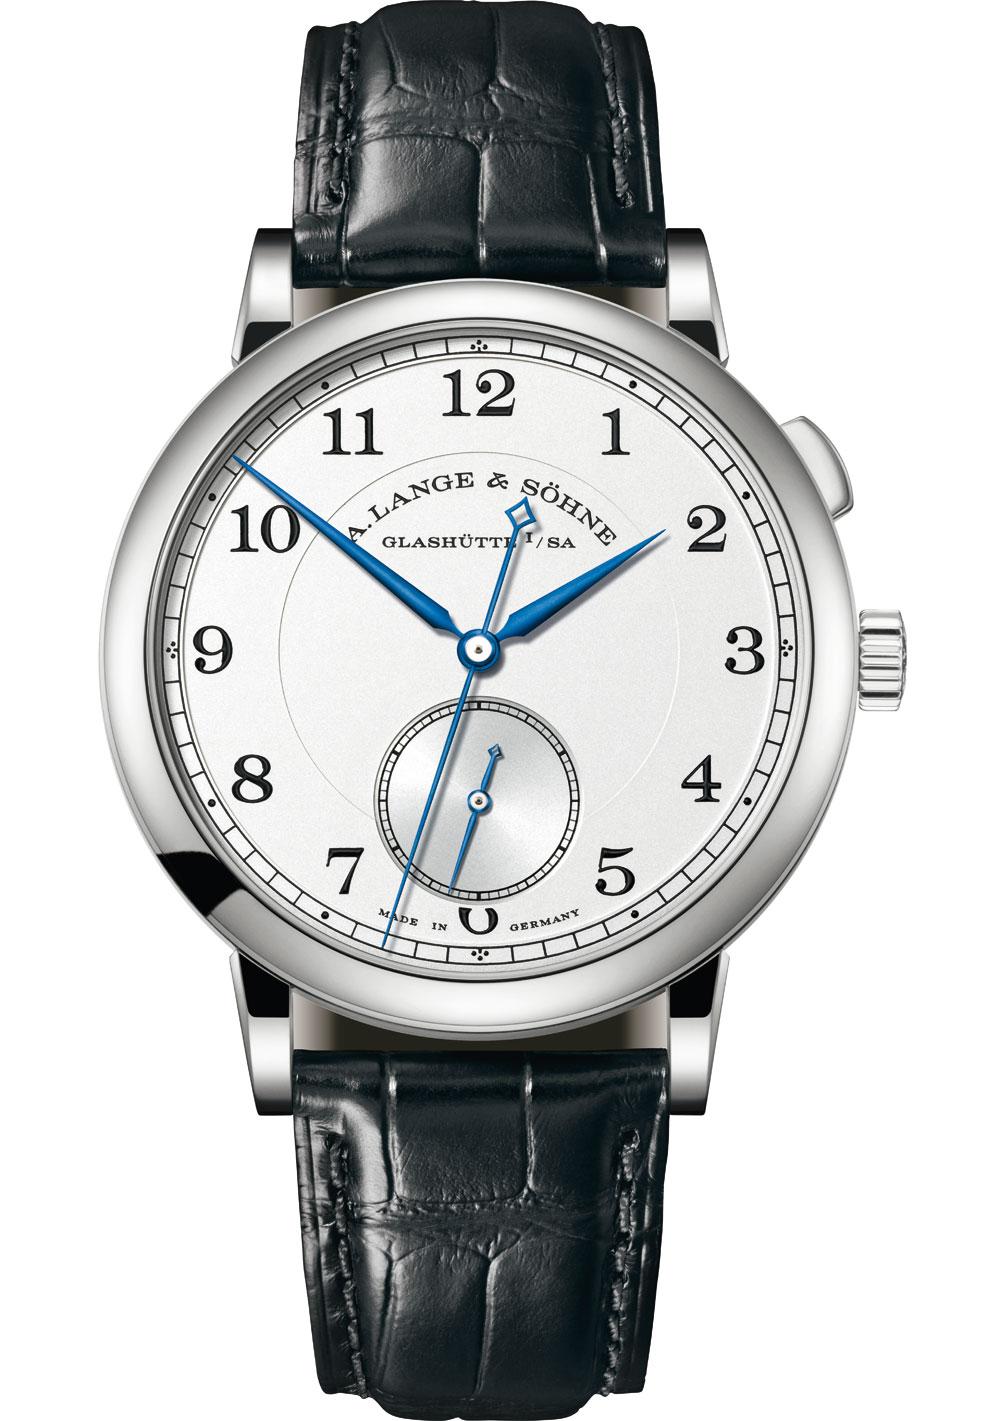 Reloj 1815 Homage to Walter Lange de A. Lange & Söhne oro blanco